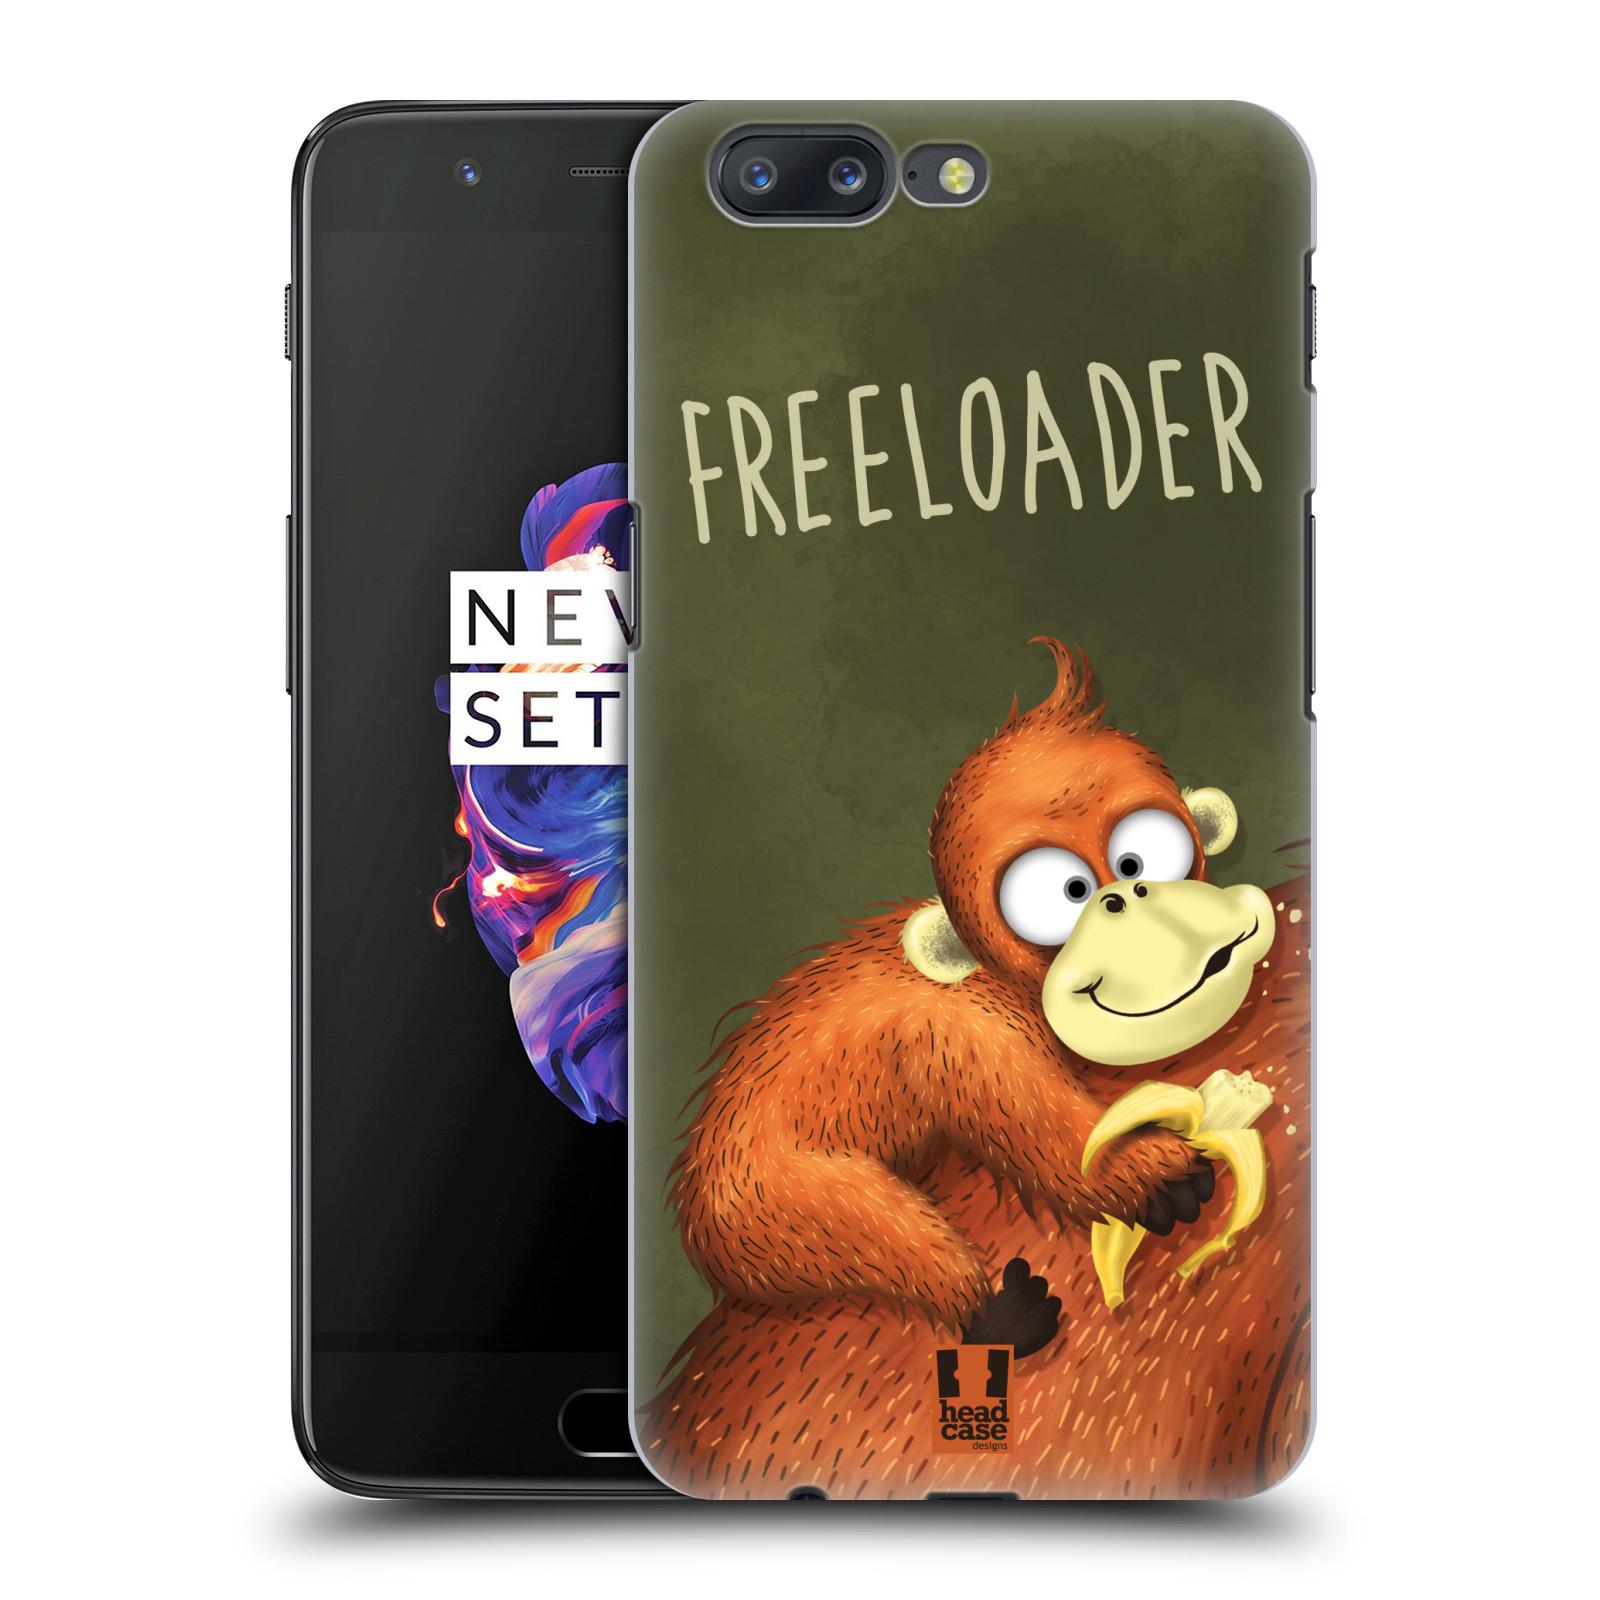 Plastové pouzdro na mobil OnePlus 5 - Head Case - Opičák Freeloader